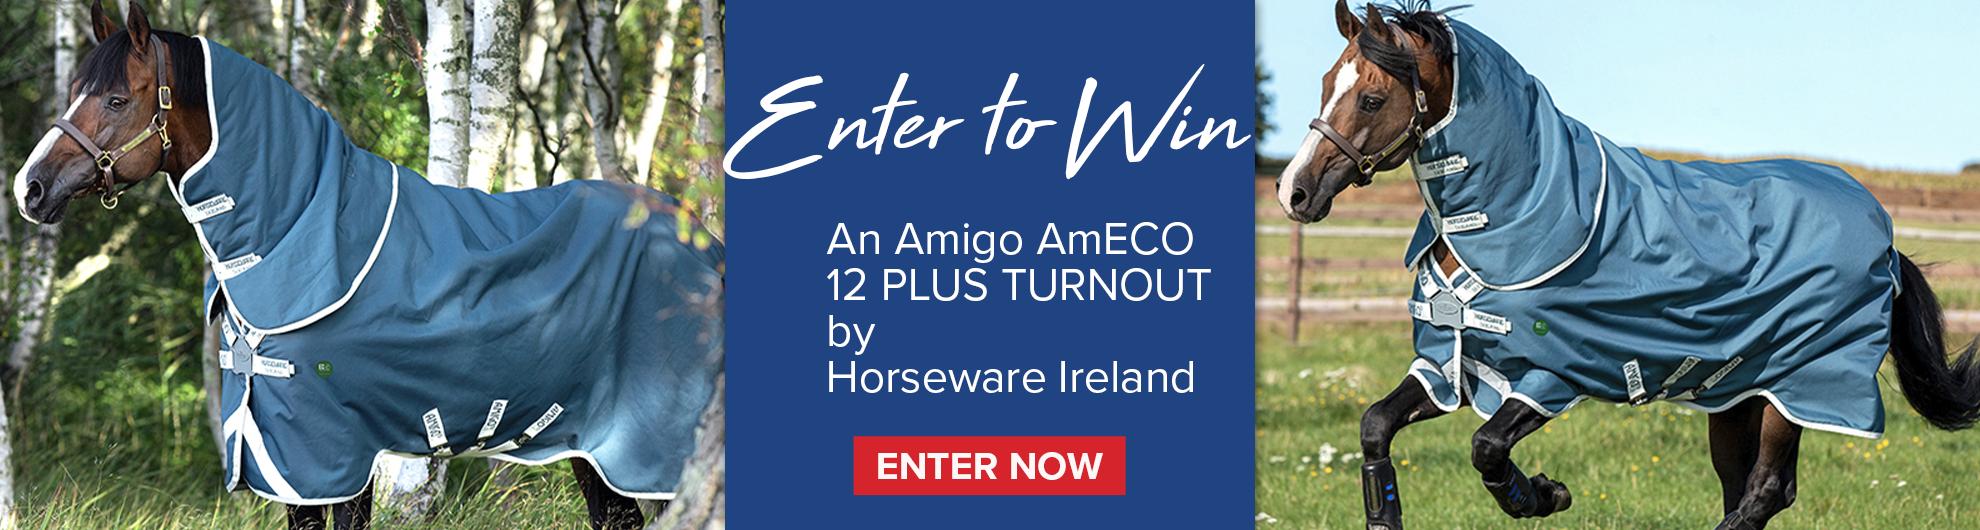 Horseware Amigo AmECO Giveaway